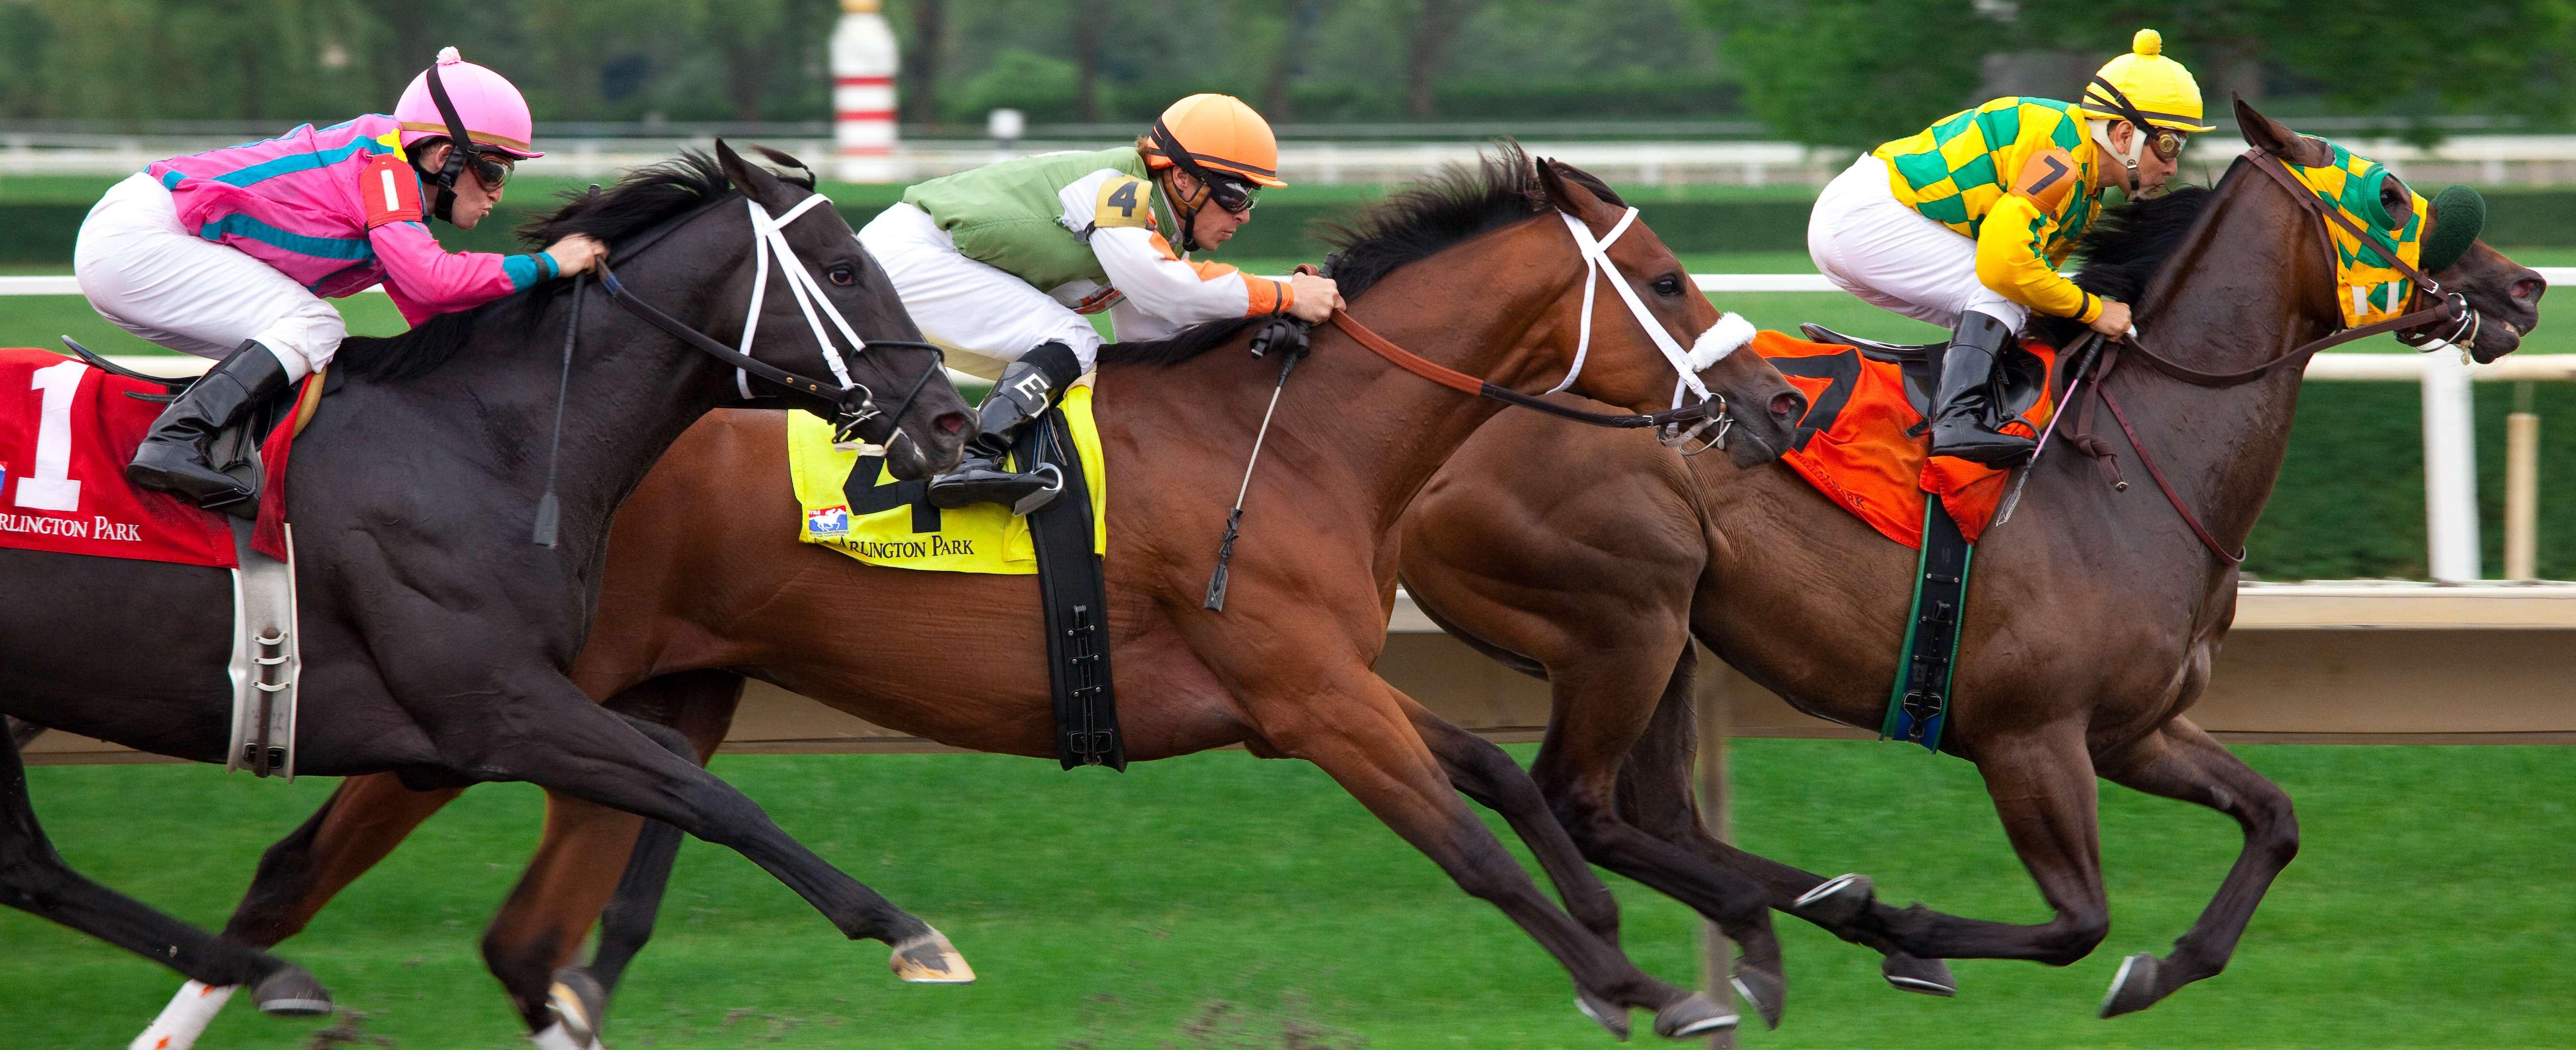 afbeelding paardenrennen